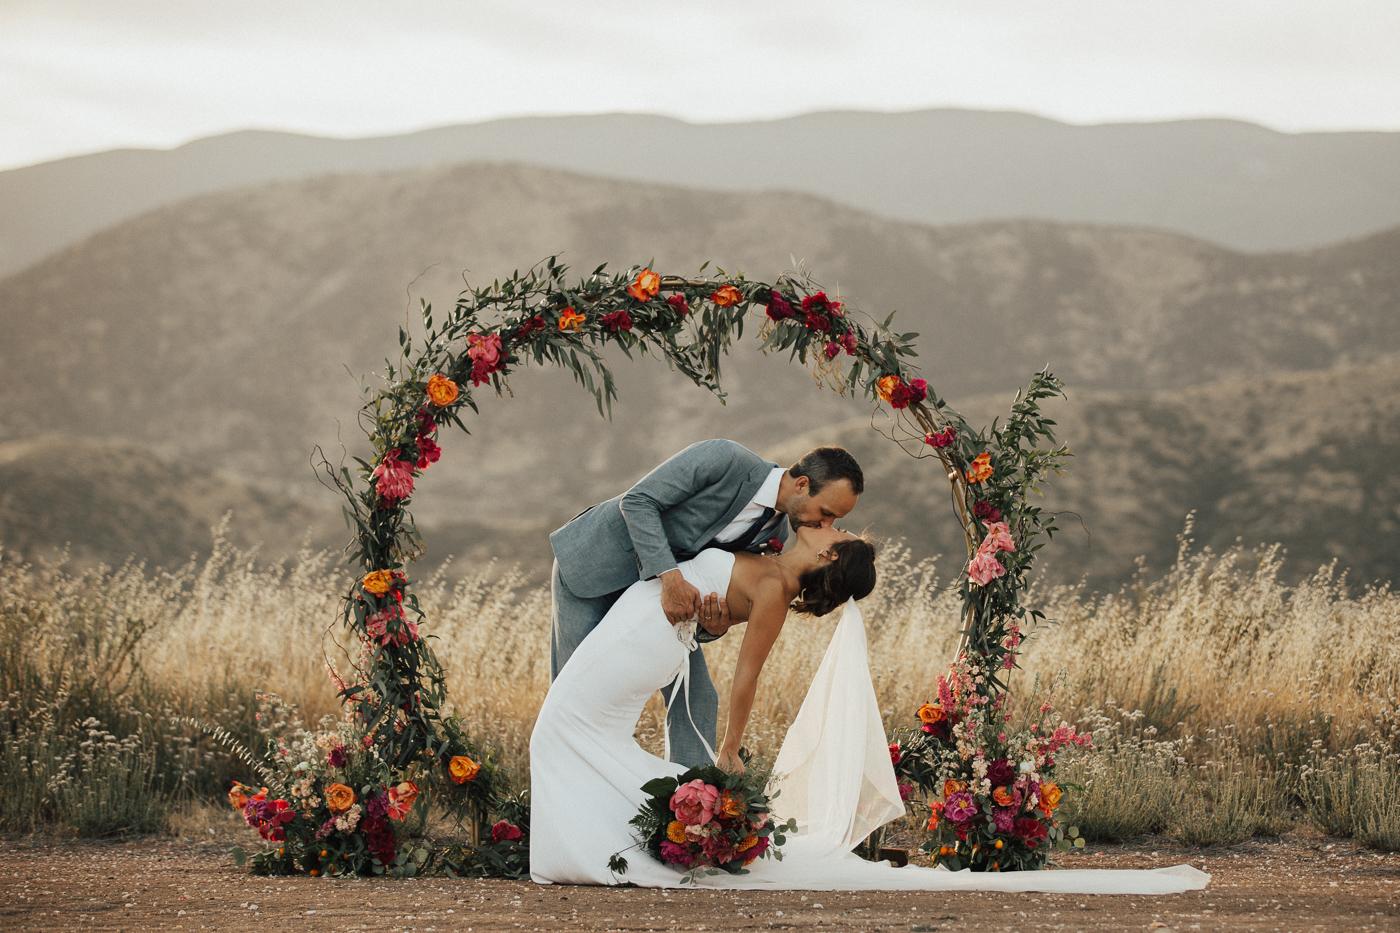 petal floral wedding photo